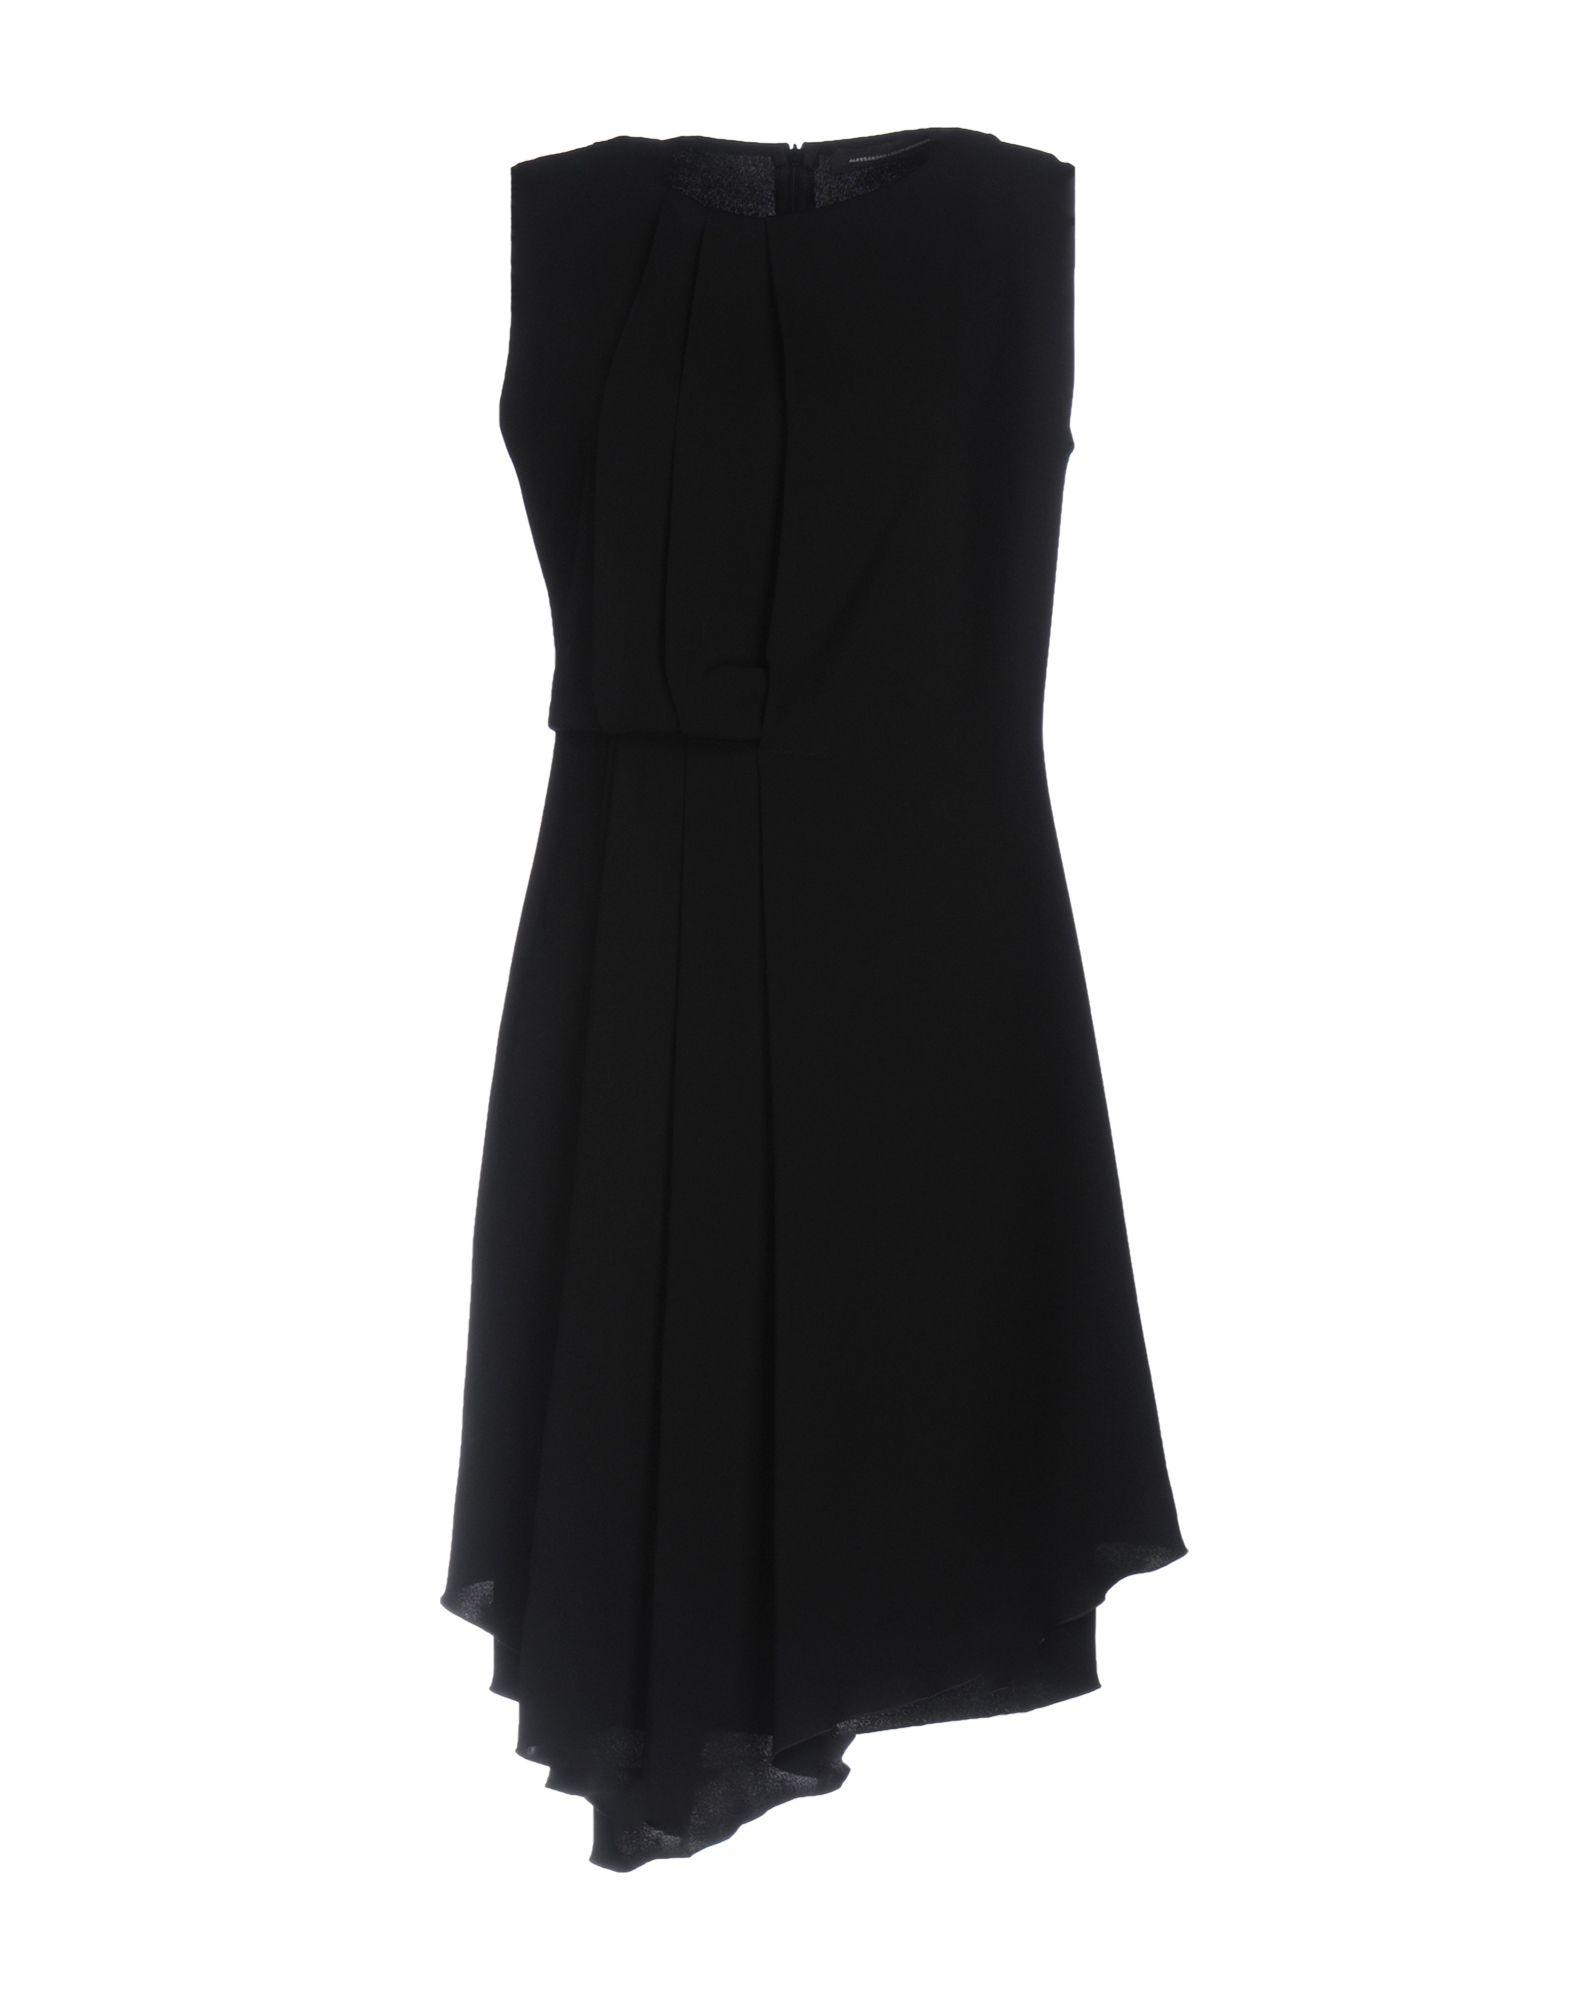 ALESSANDRO LEGORA Короткое платье slik l1819 6 5x15 4x98 d58 6 et32 w